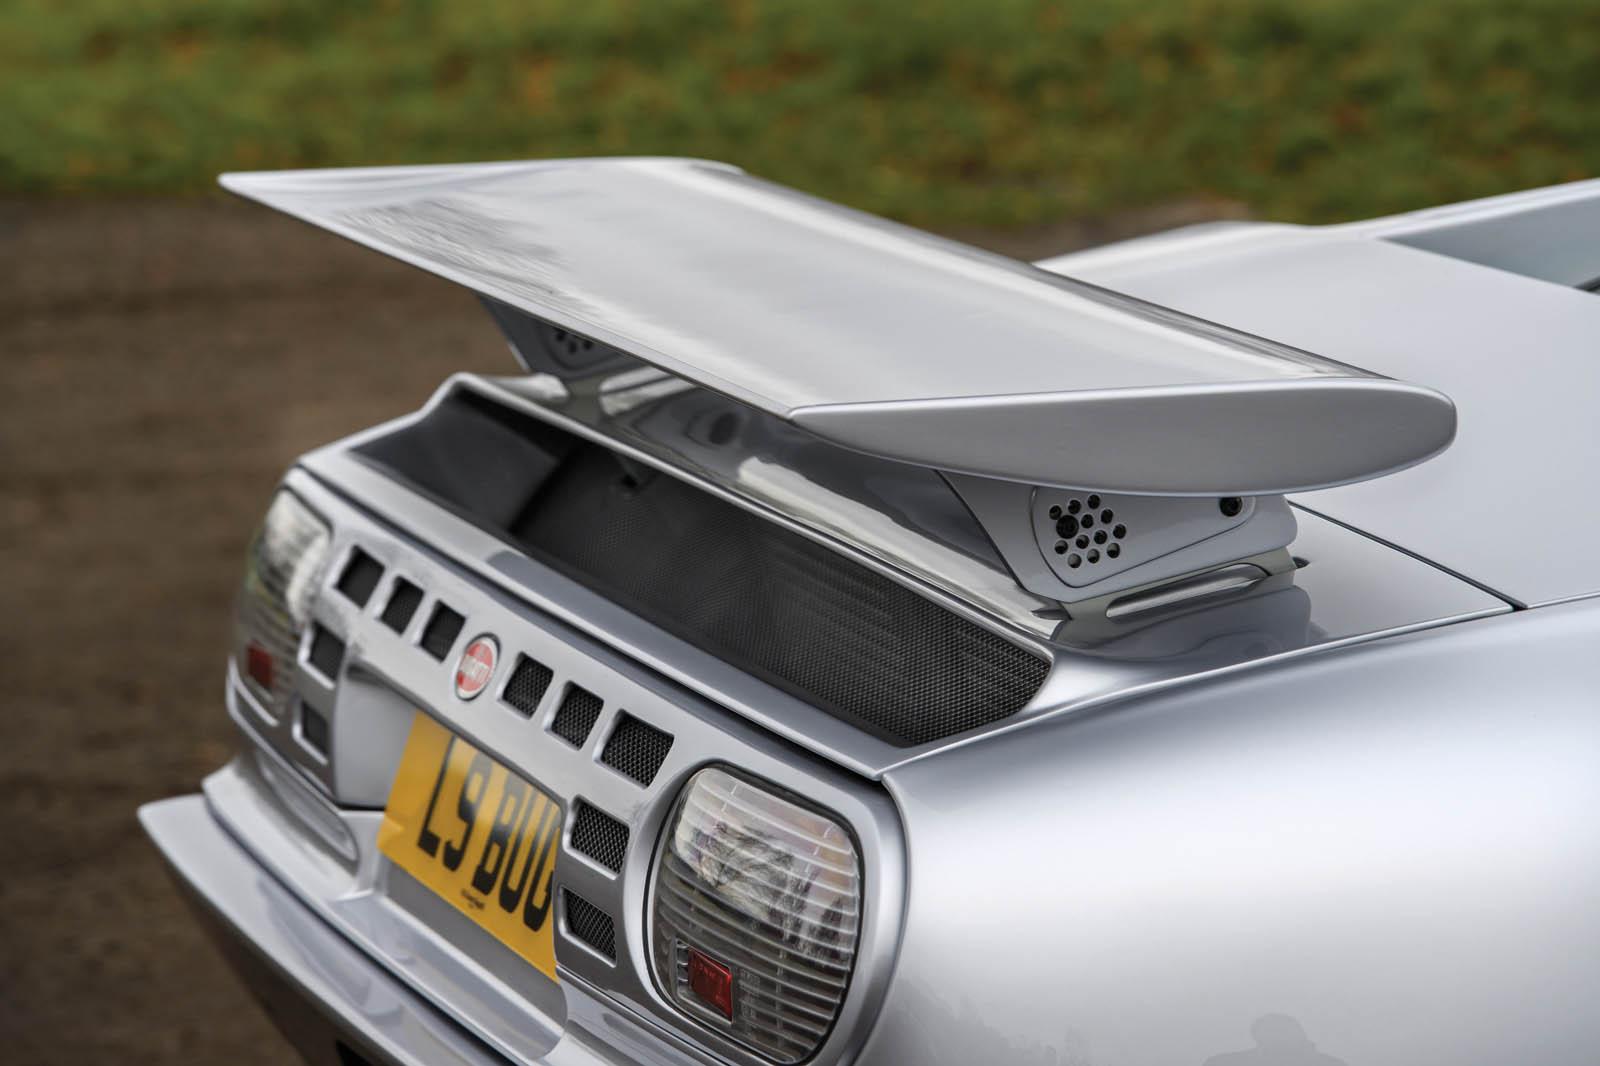 bugatti-eb110-ss-prototype-11